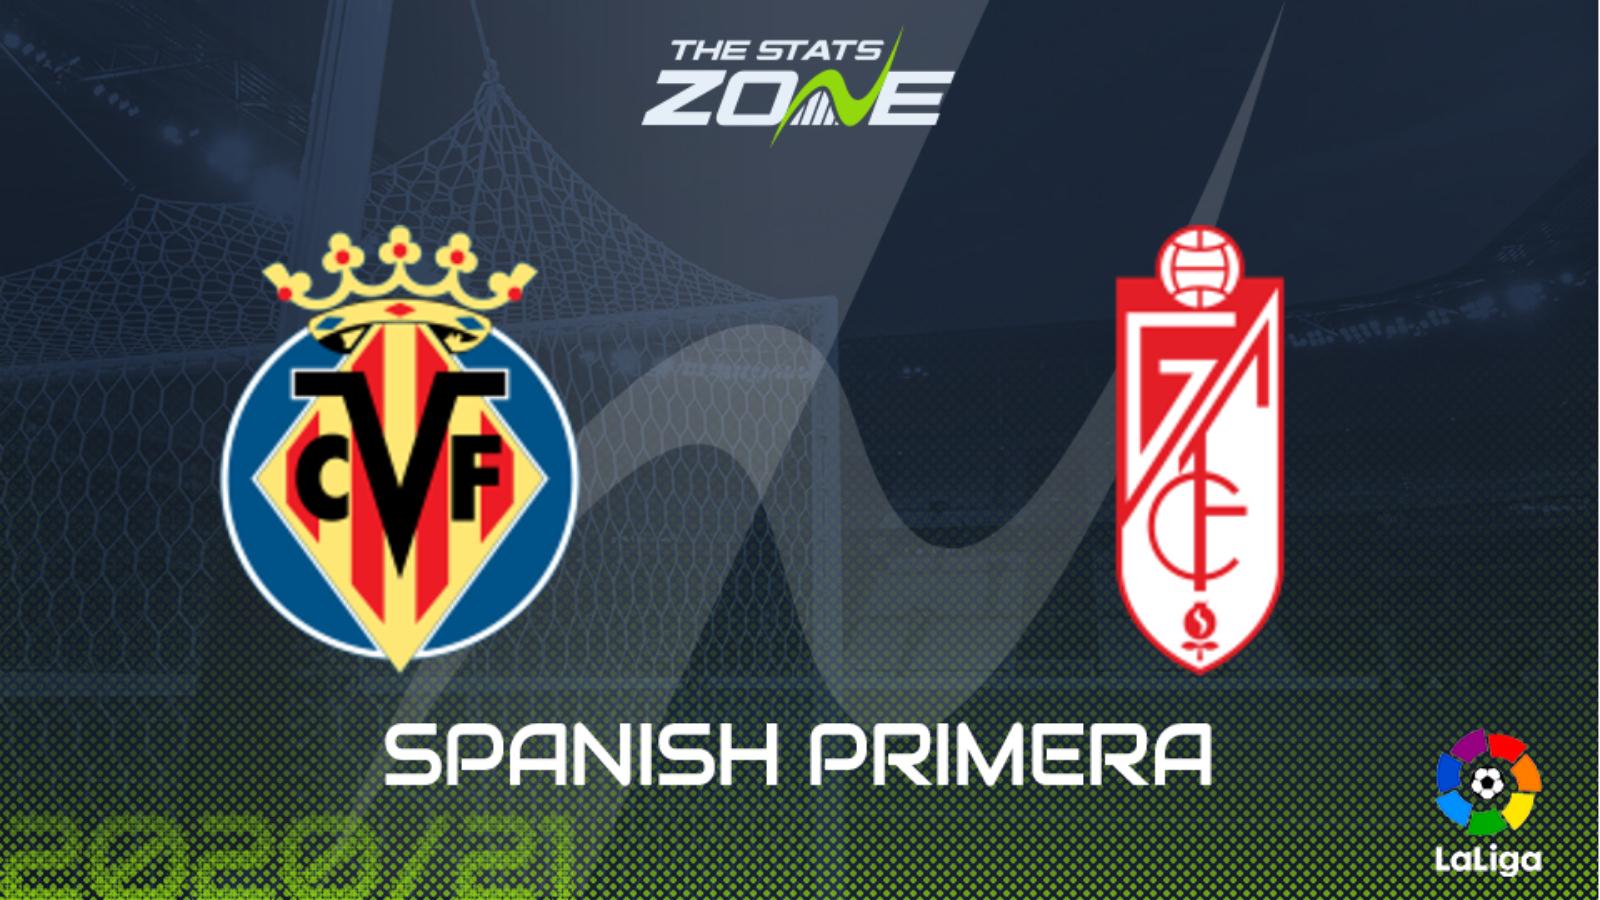 Villarreal granada betting tips nj sports betting legal